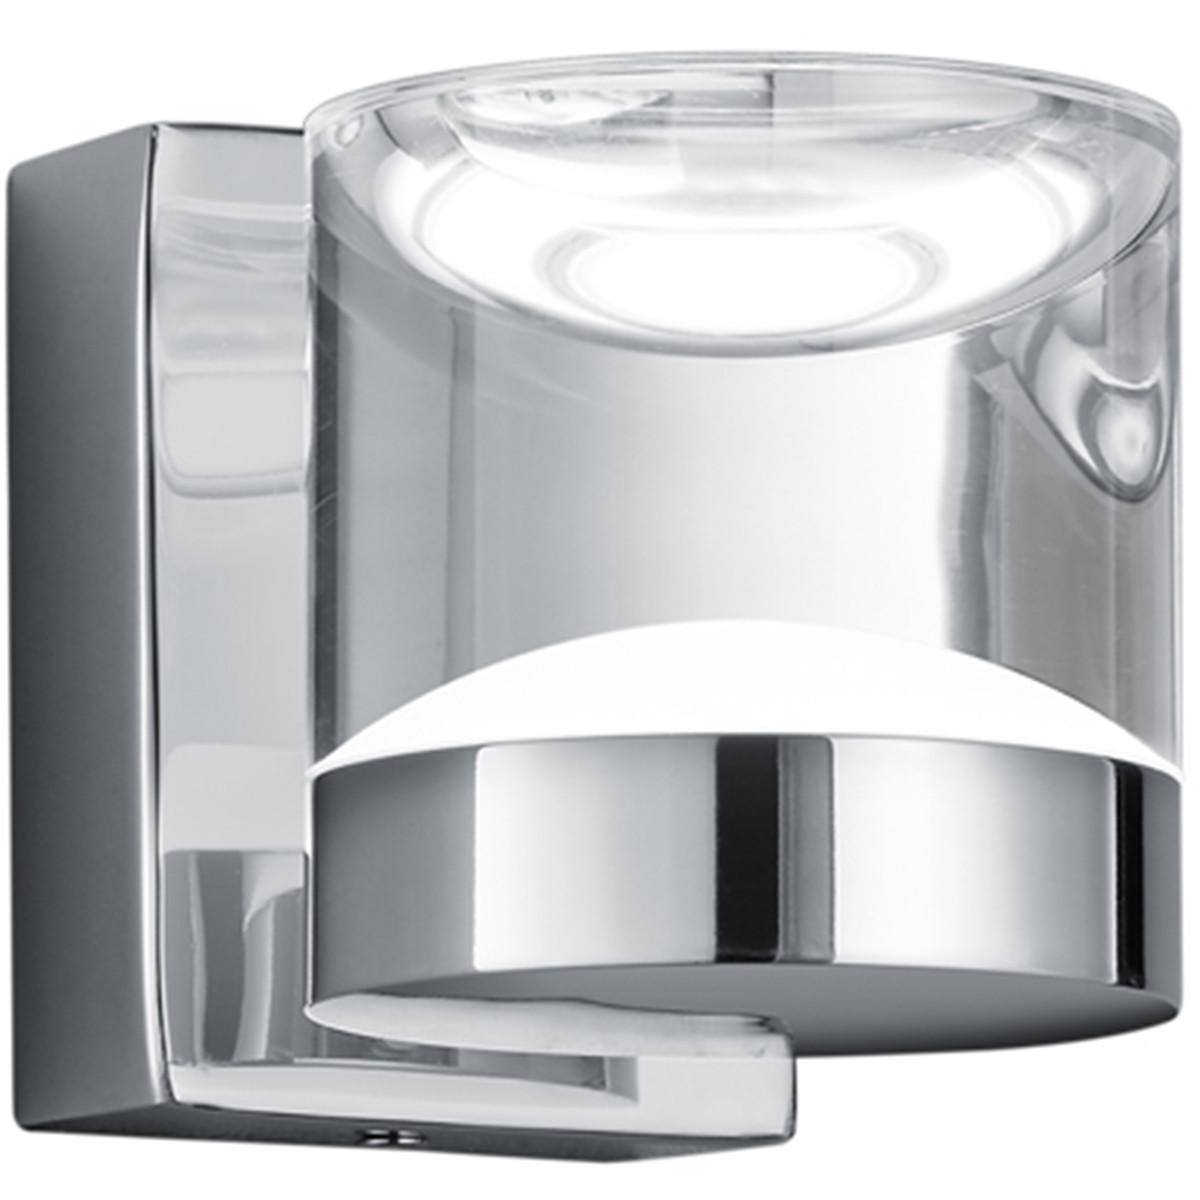 LED Wandlamp - Trion Brino - 3W - Warm Wit 3000K - 1-lichts - Rond - Glans Chroom - Aluminium